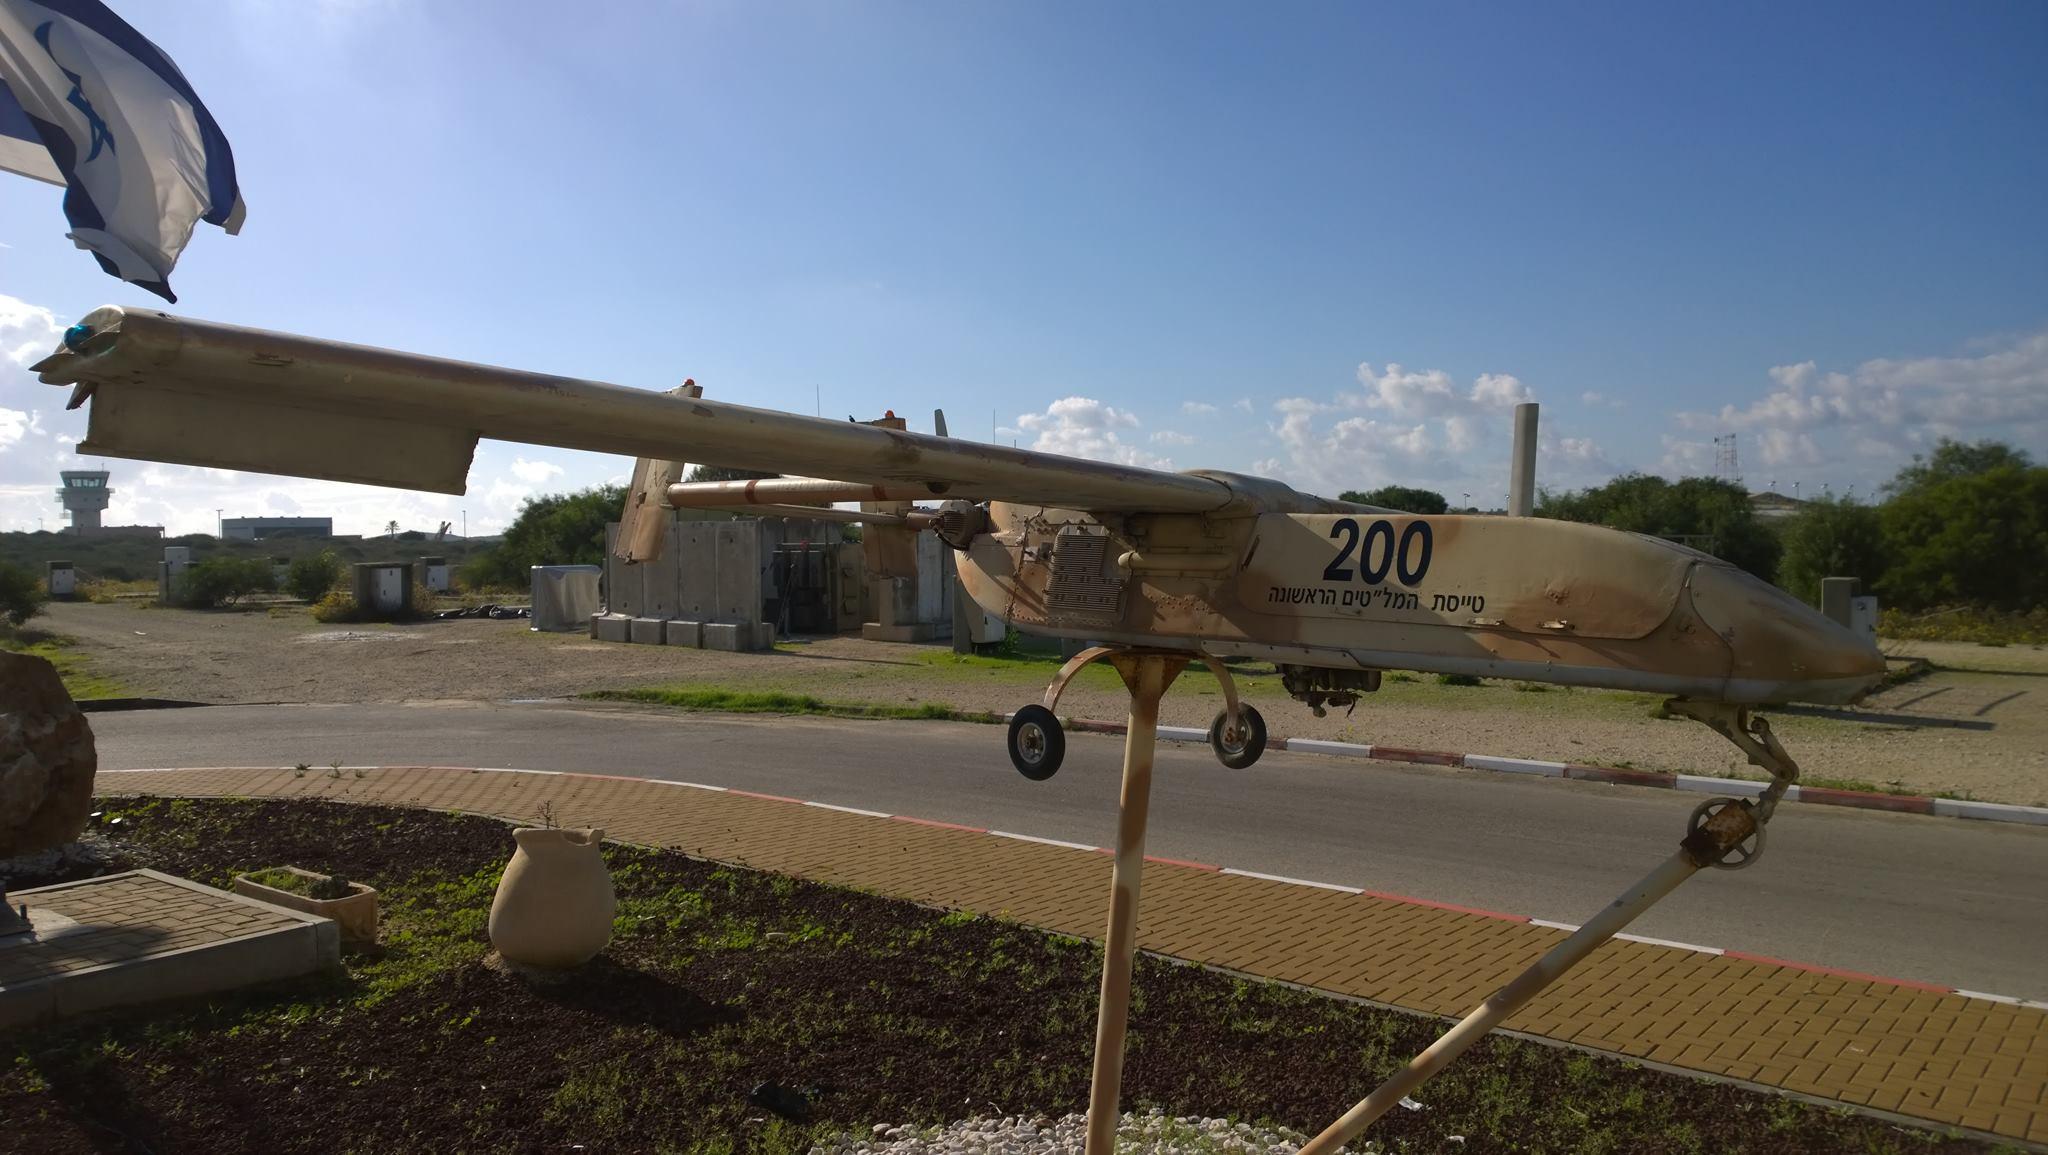 IAI Scout, the first Israeli UAV